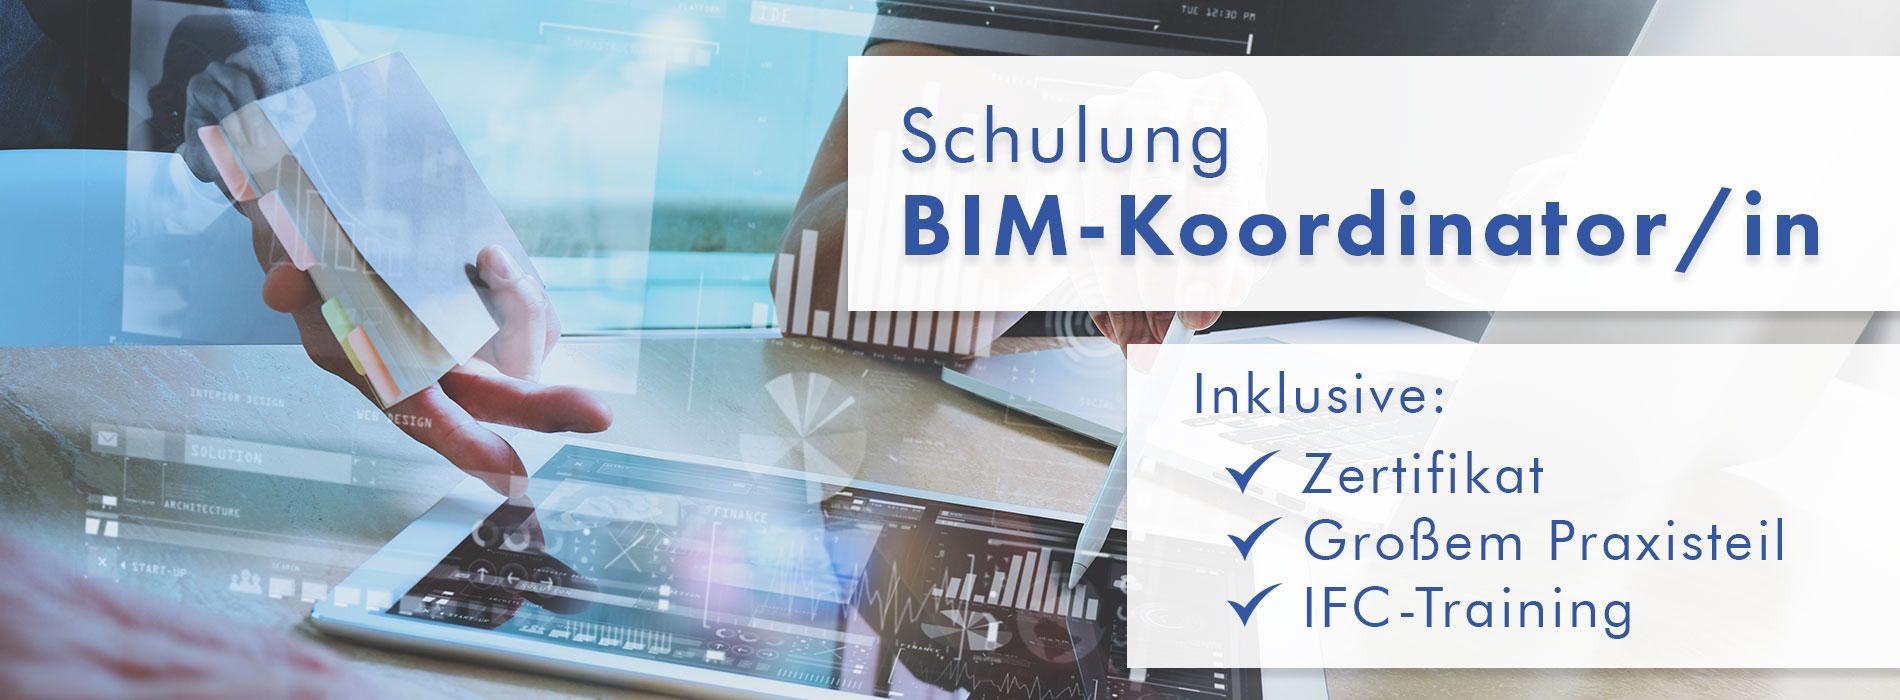 BIM-Koordinator-Schulung